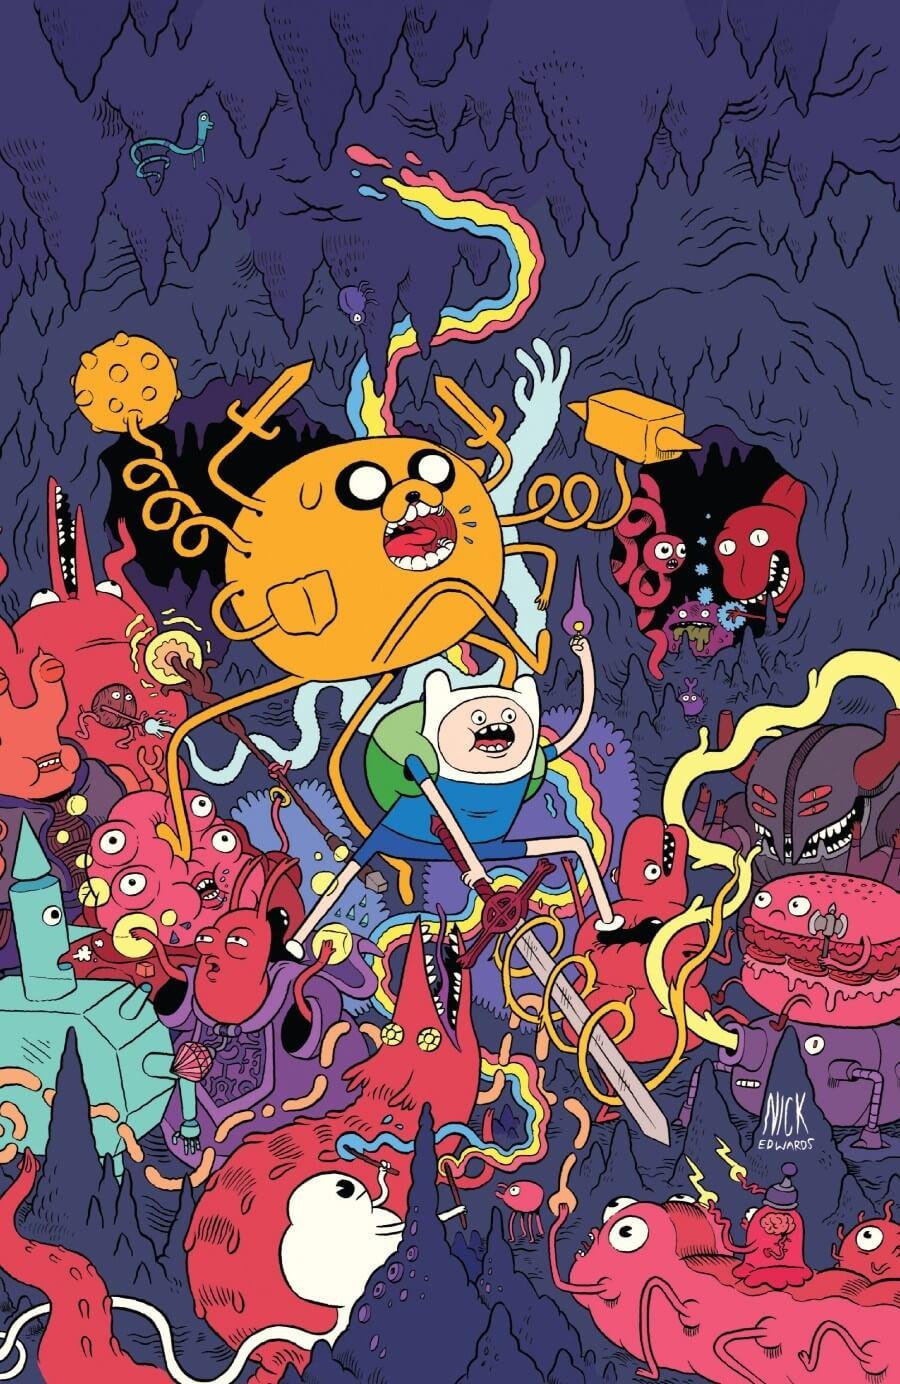 Adventure Wallpaper Bravest Warriors Adventure Time Comics 900x1384 Wallpaper Teahub Io